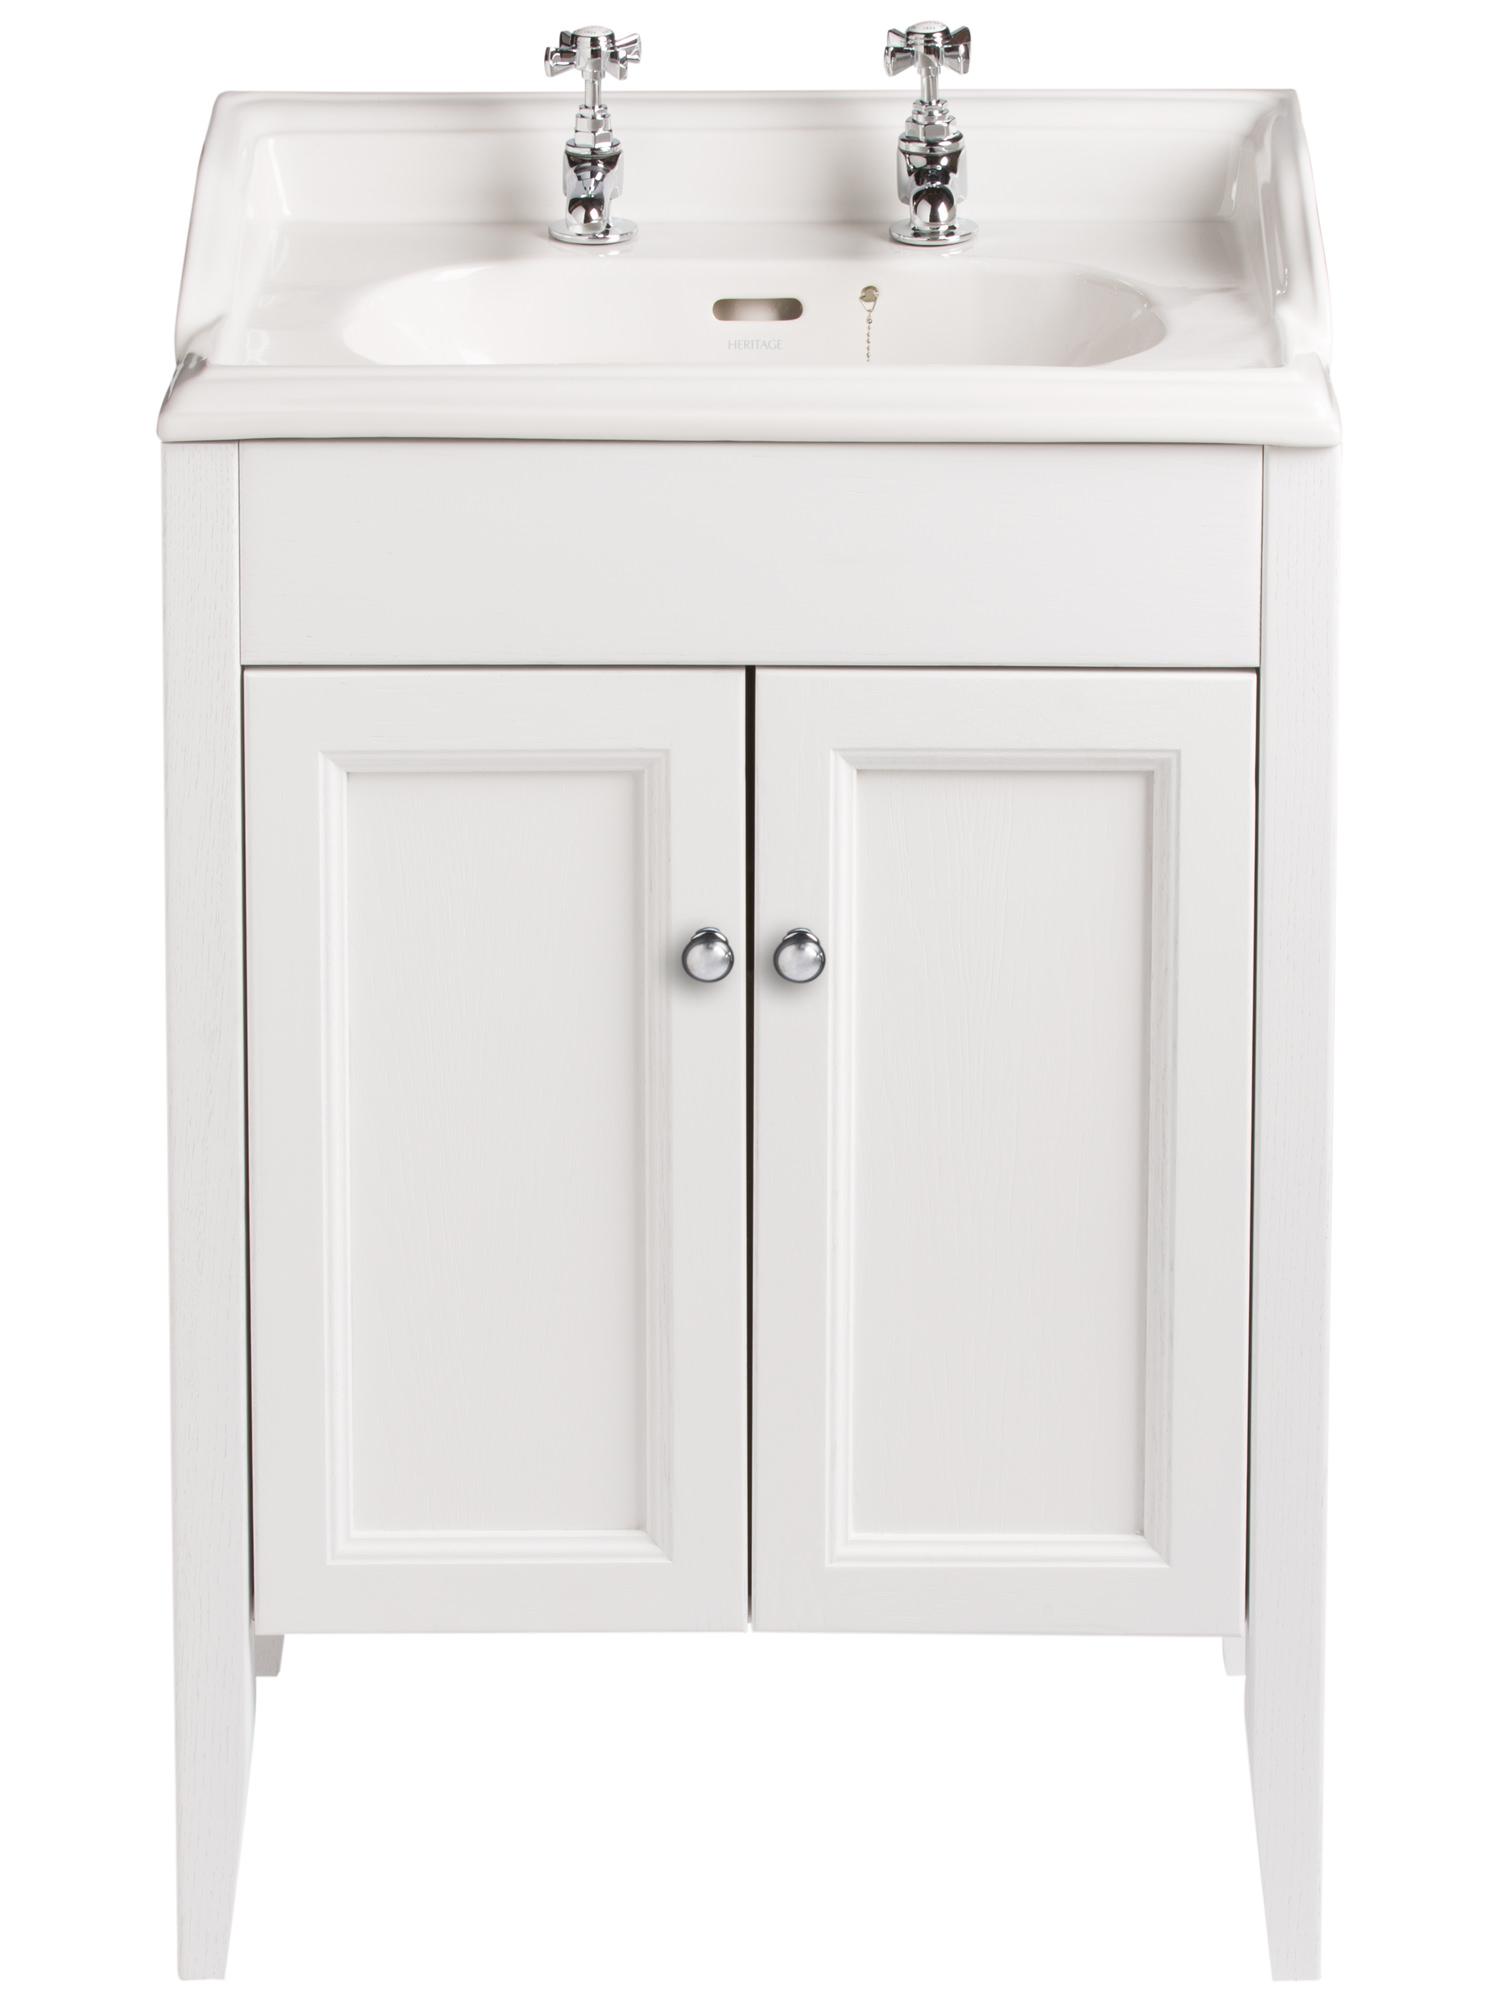 heritage caversham white ash vanity unit for dorchester square basin